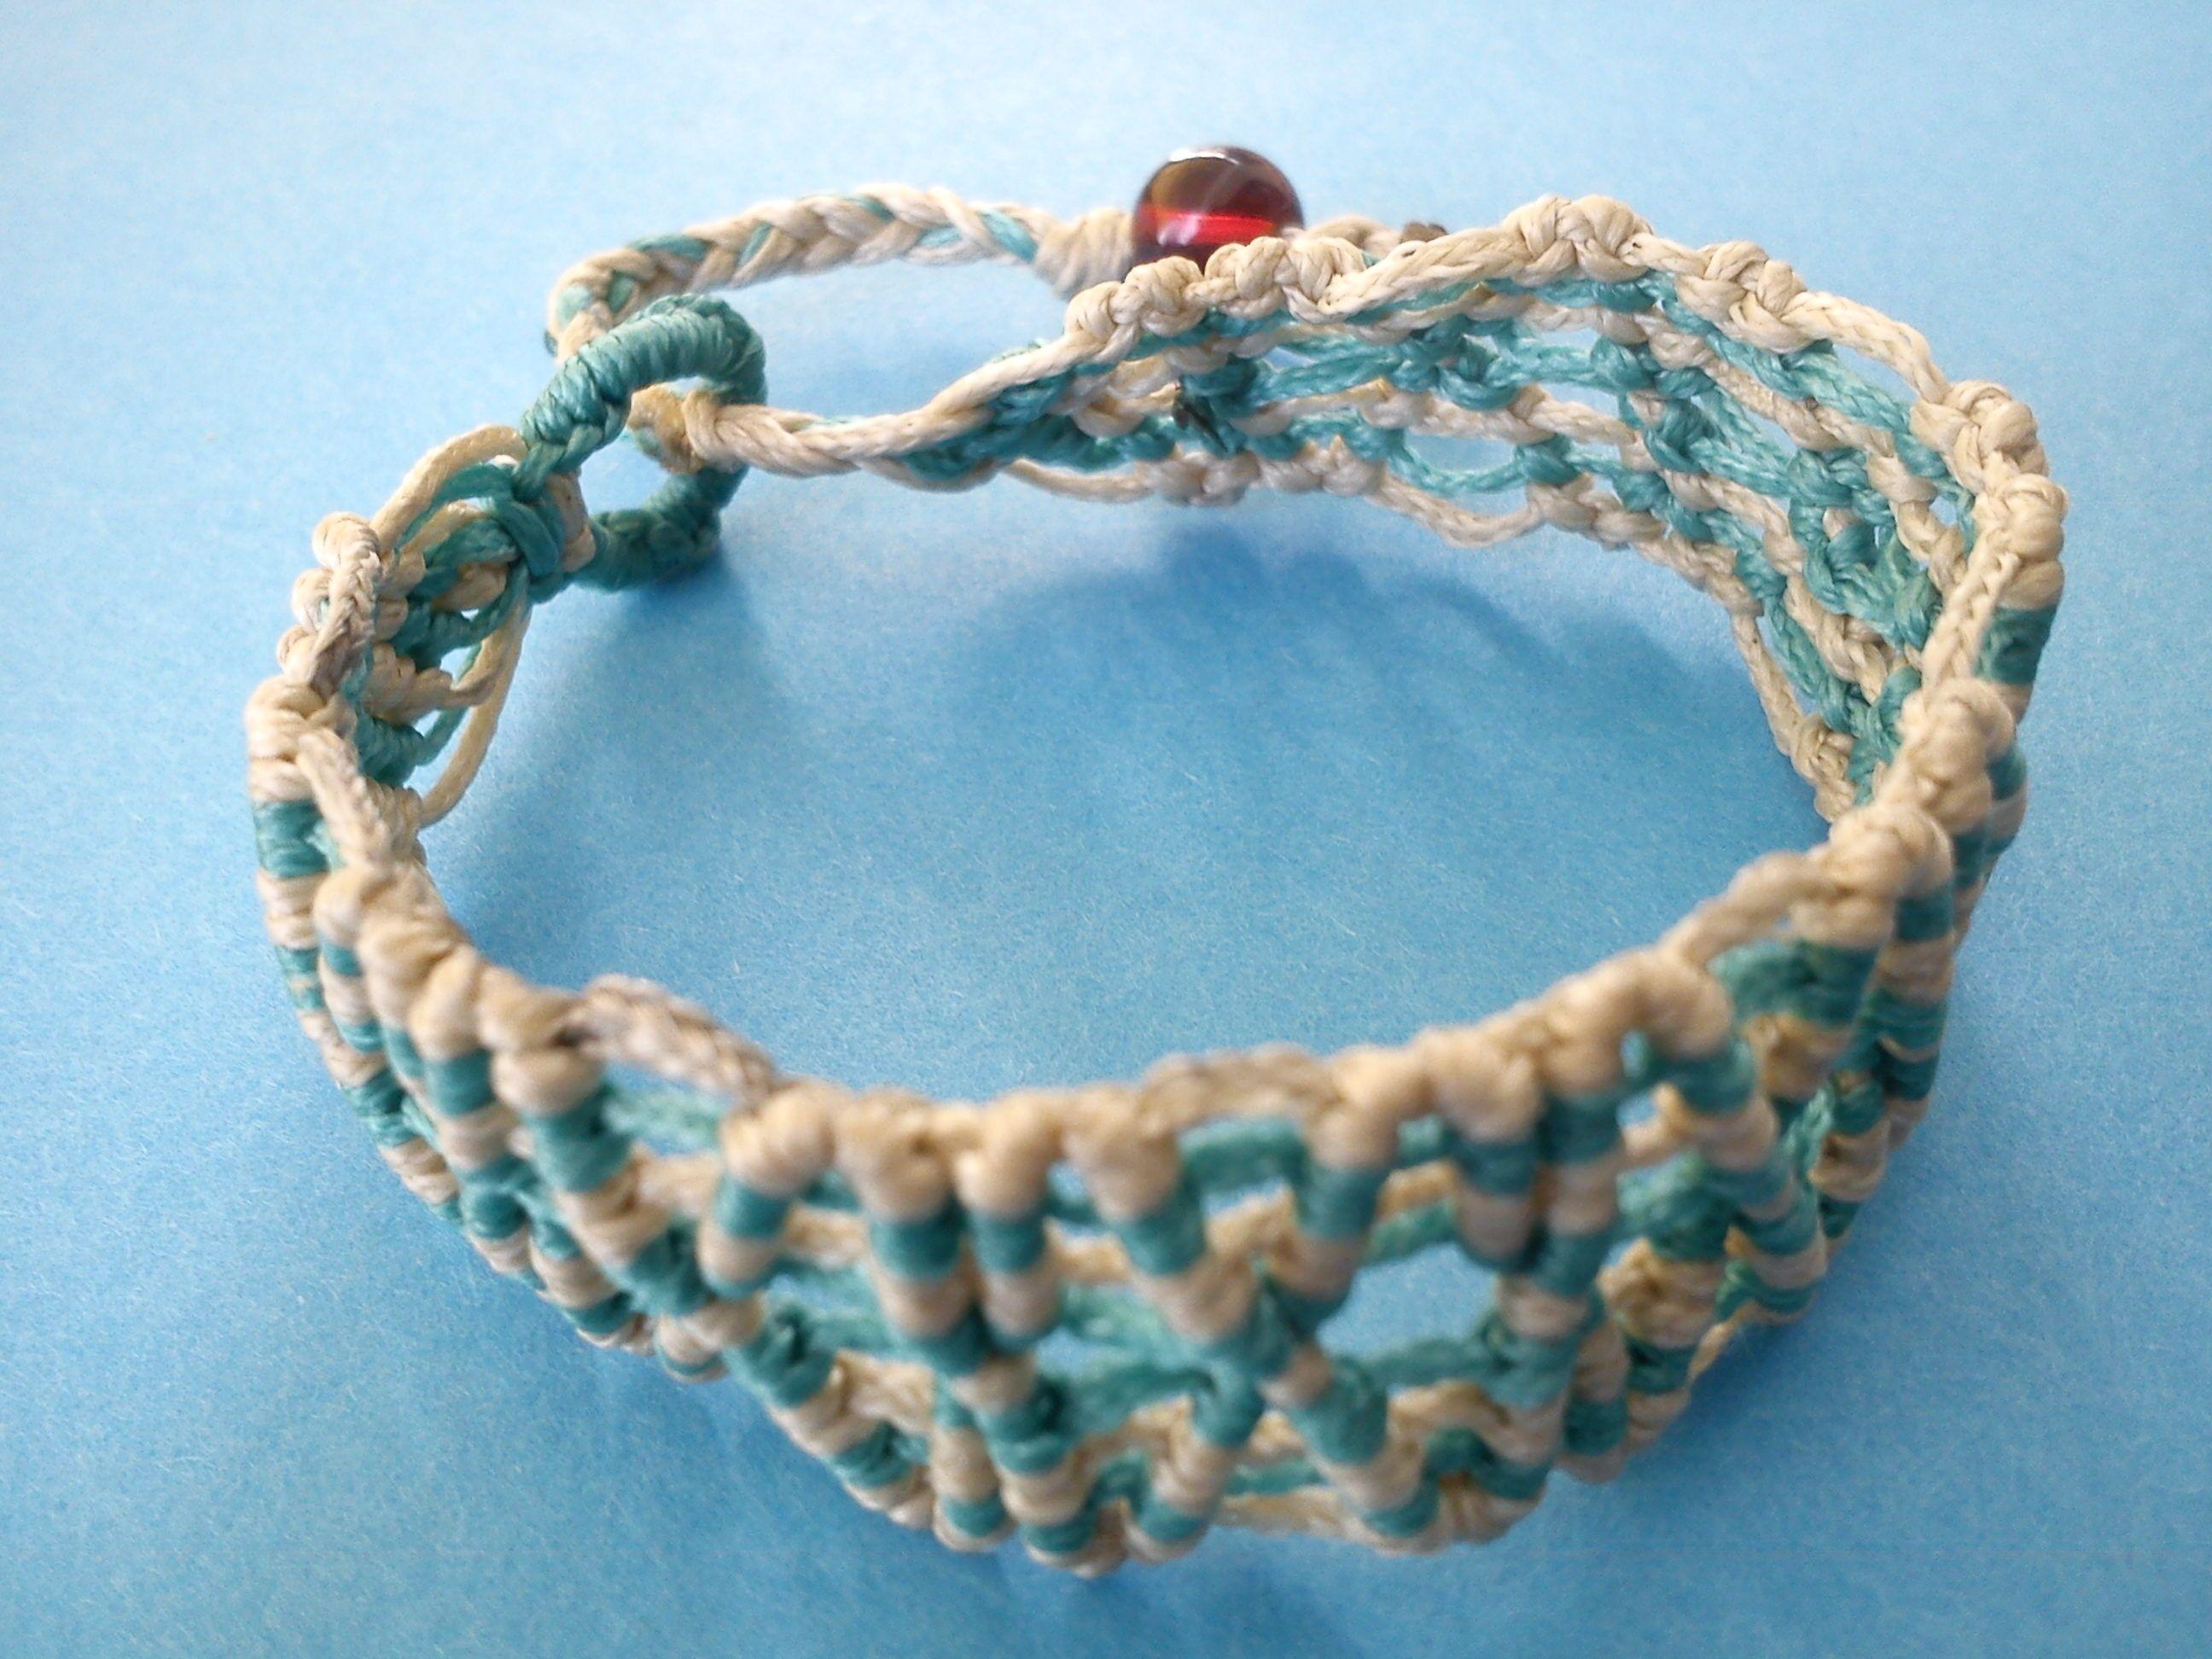 Macrame braceletsu macrame bracelets and bracelets